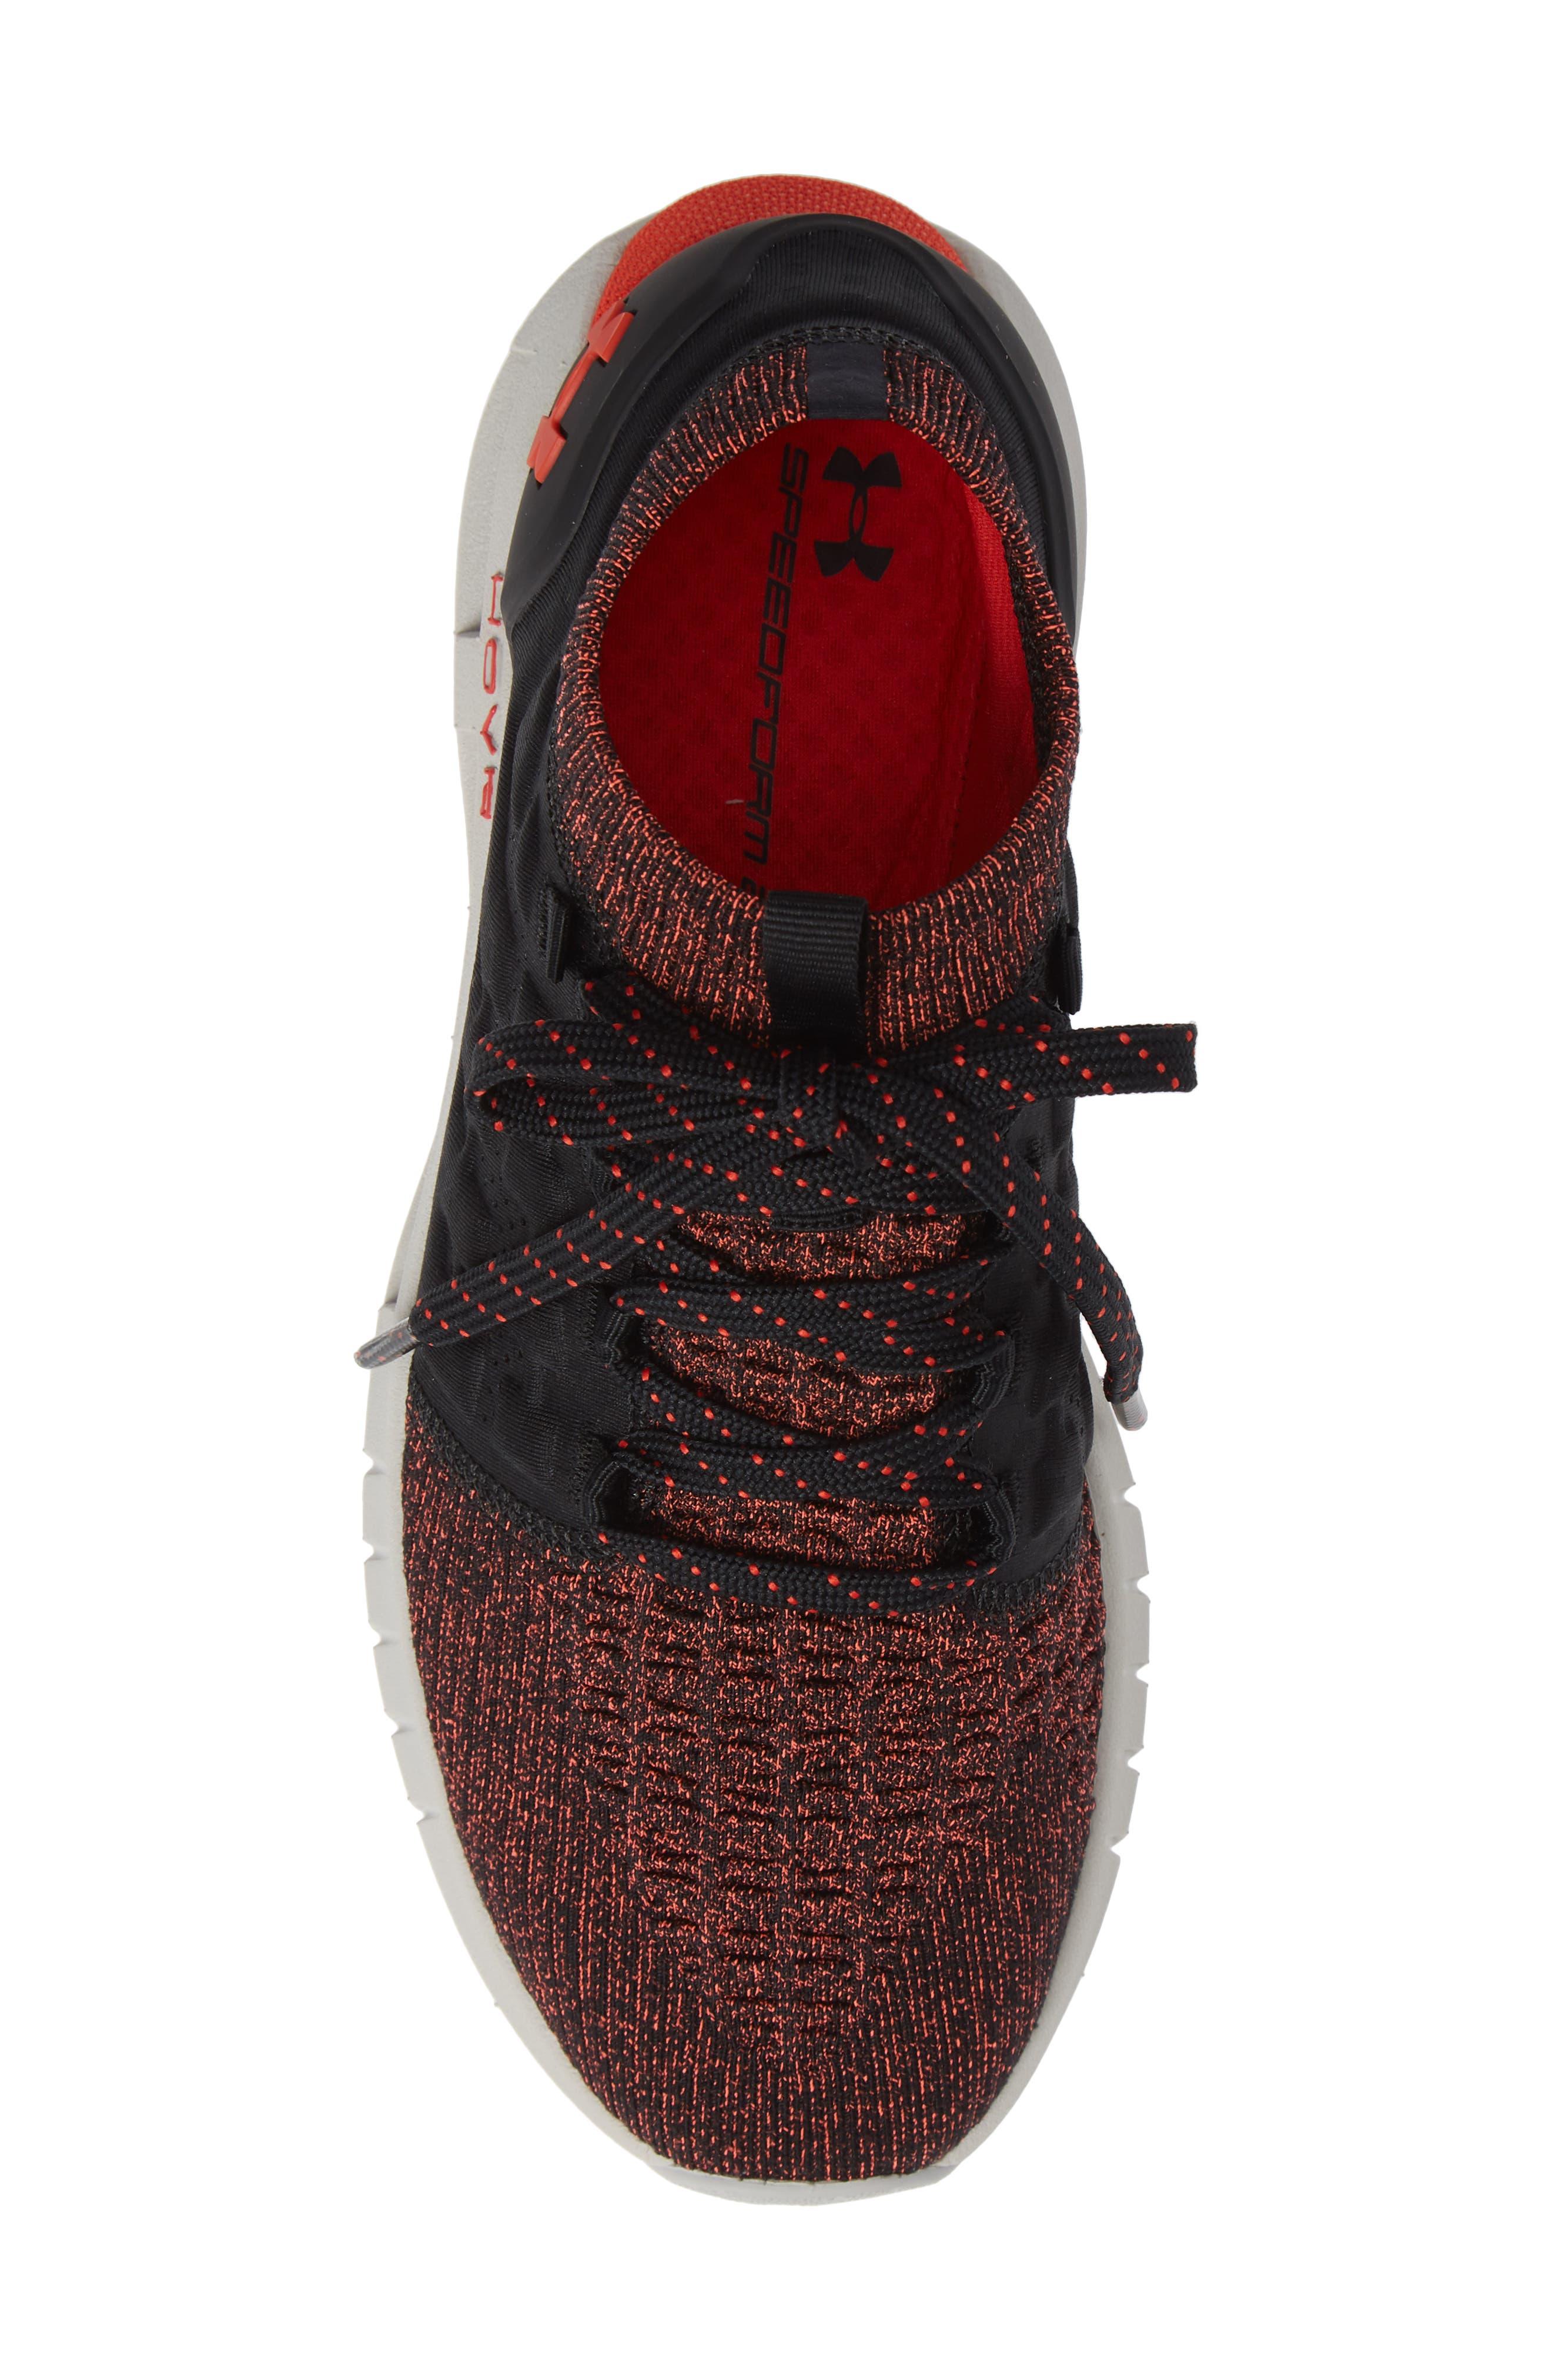 HOVR Phantom NC Sneaker,                             Alternate thumbnail 3, color,                             Black/ Ghost Grey/ Radio Red